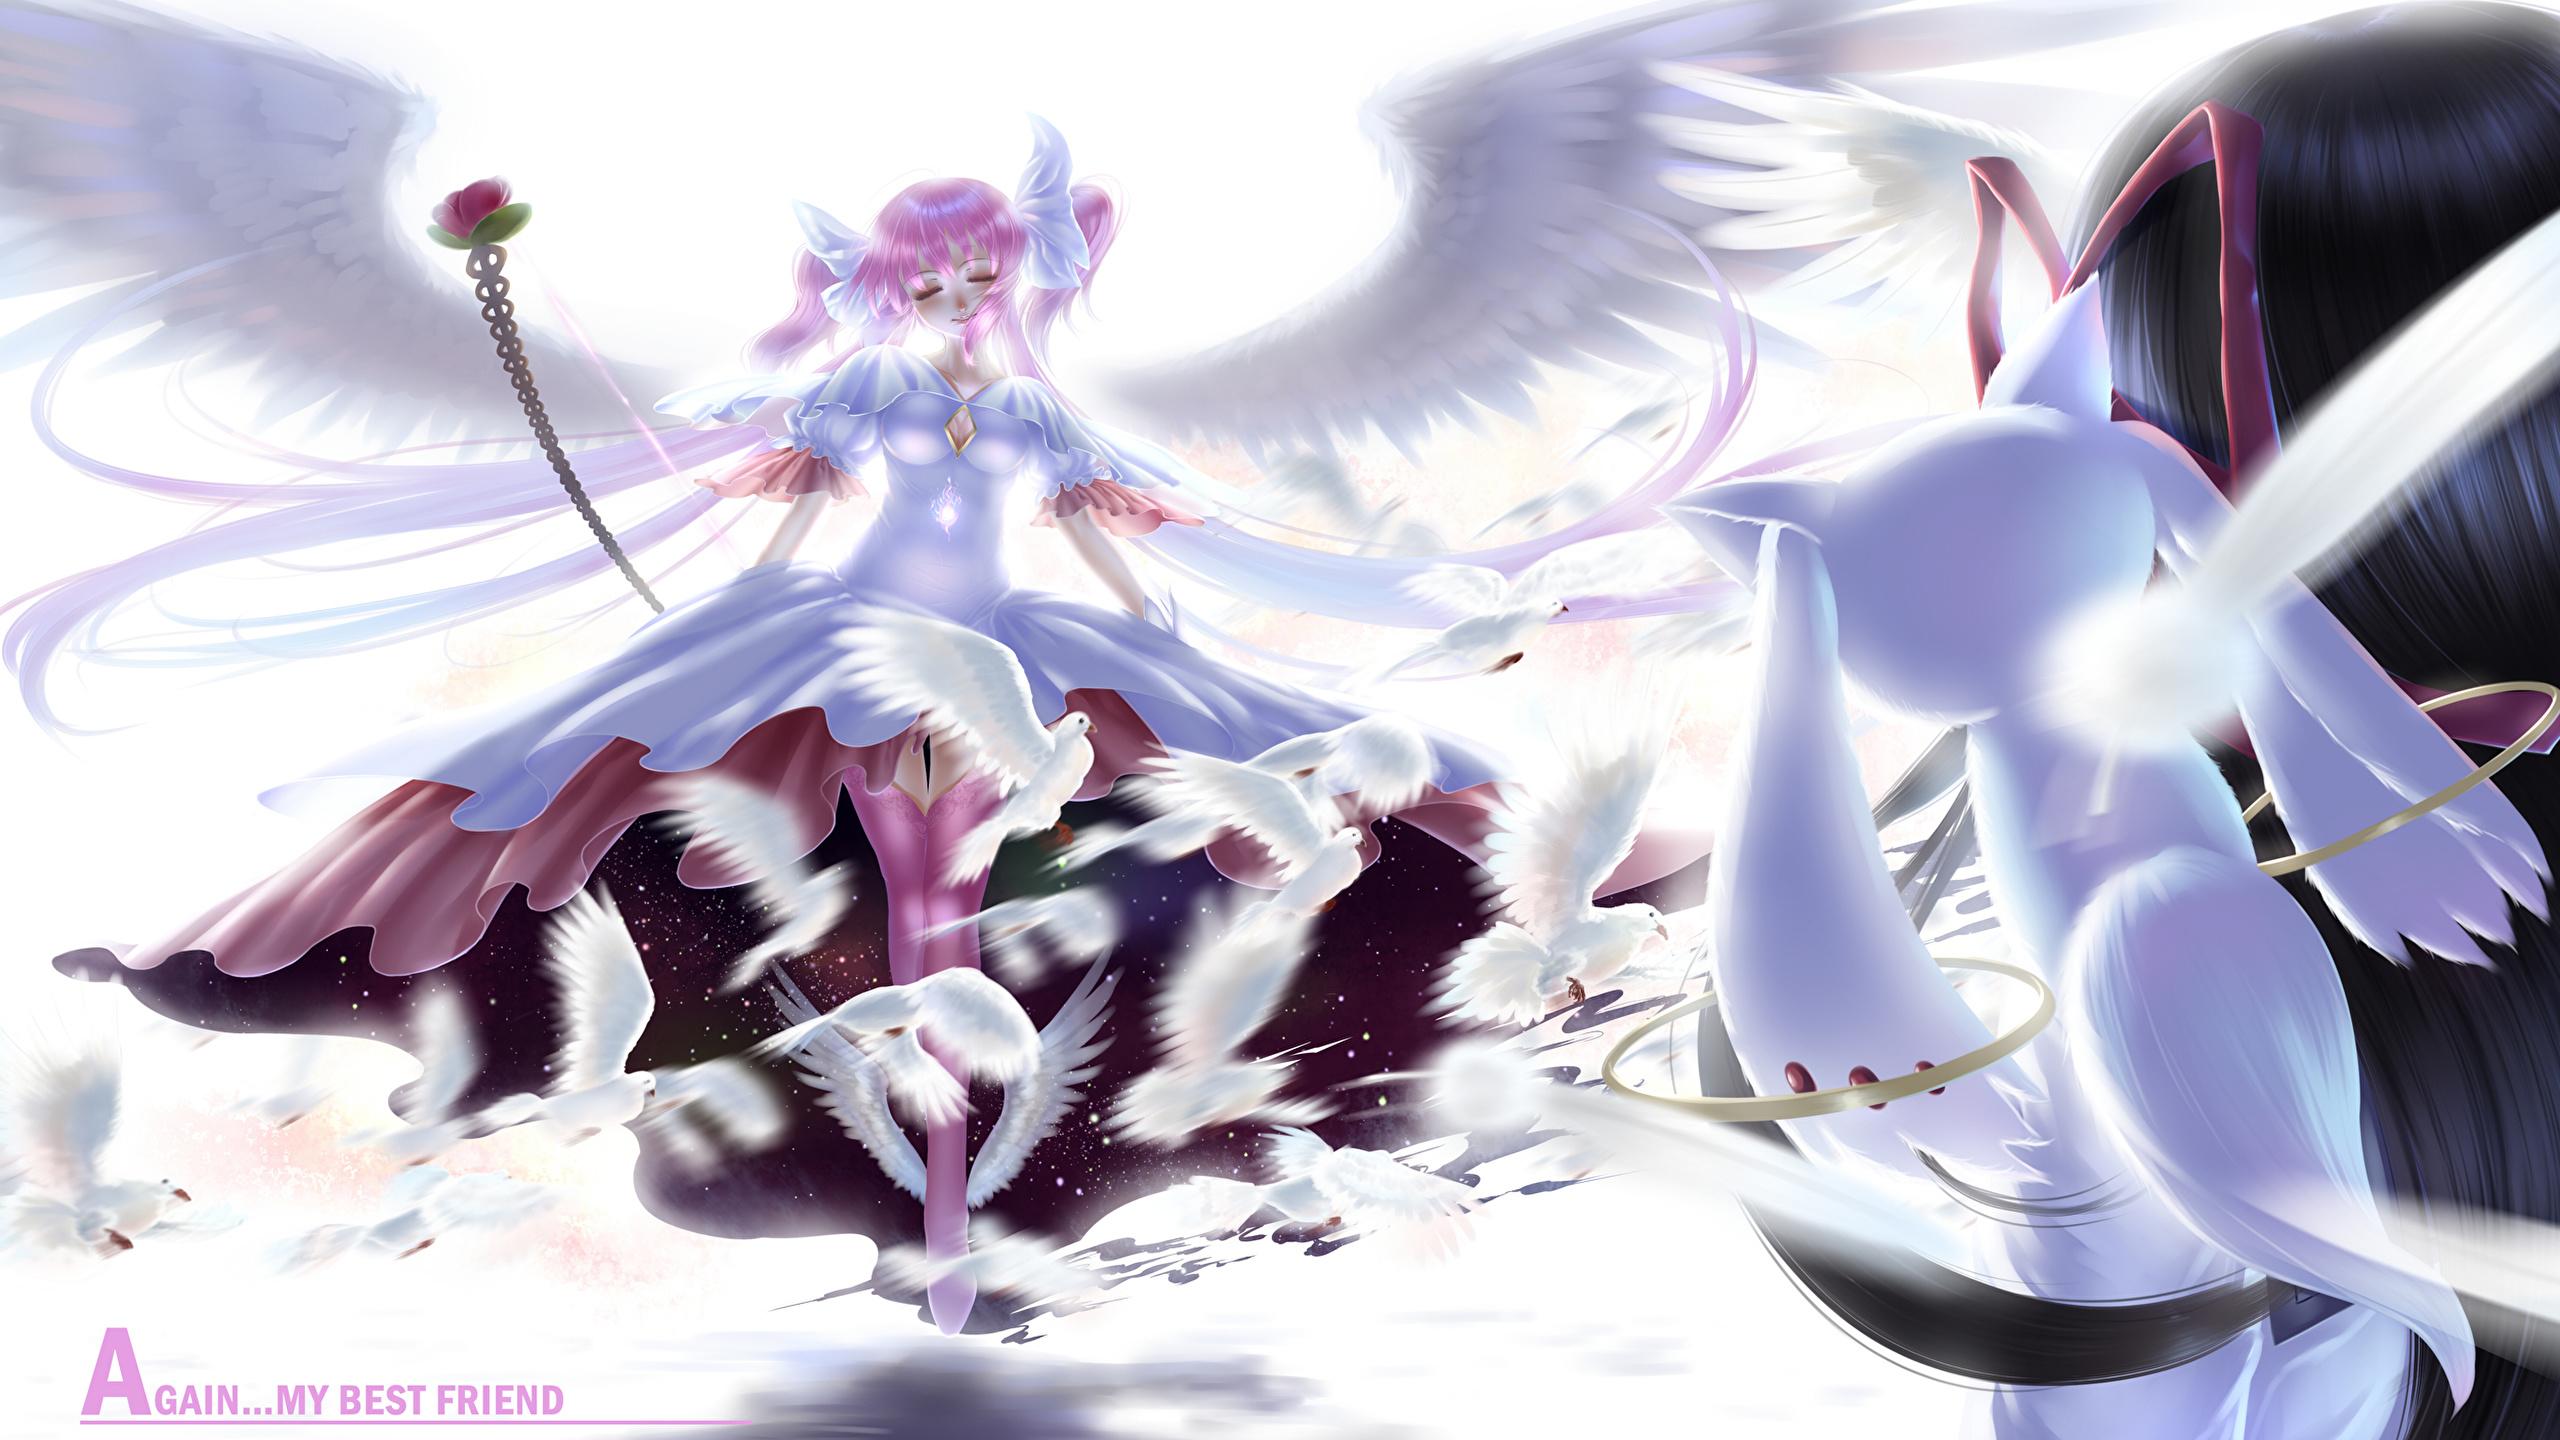 Wallpaper Mahou Shoujo Madoka Magica Anime 2560x1440